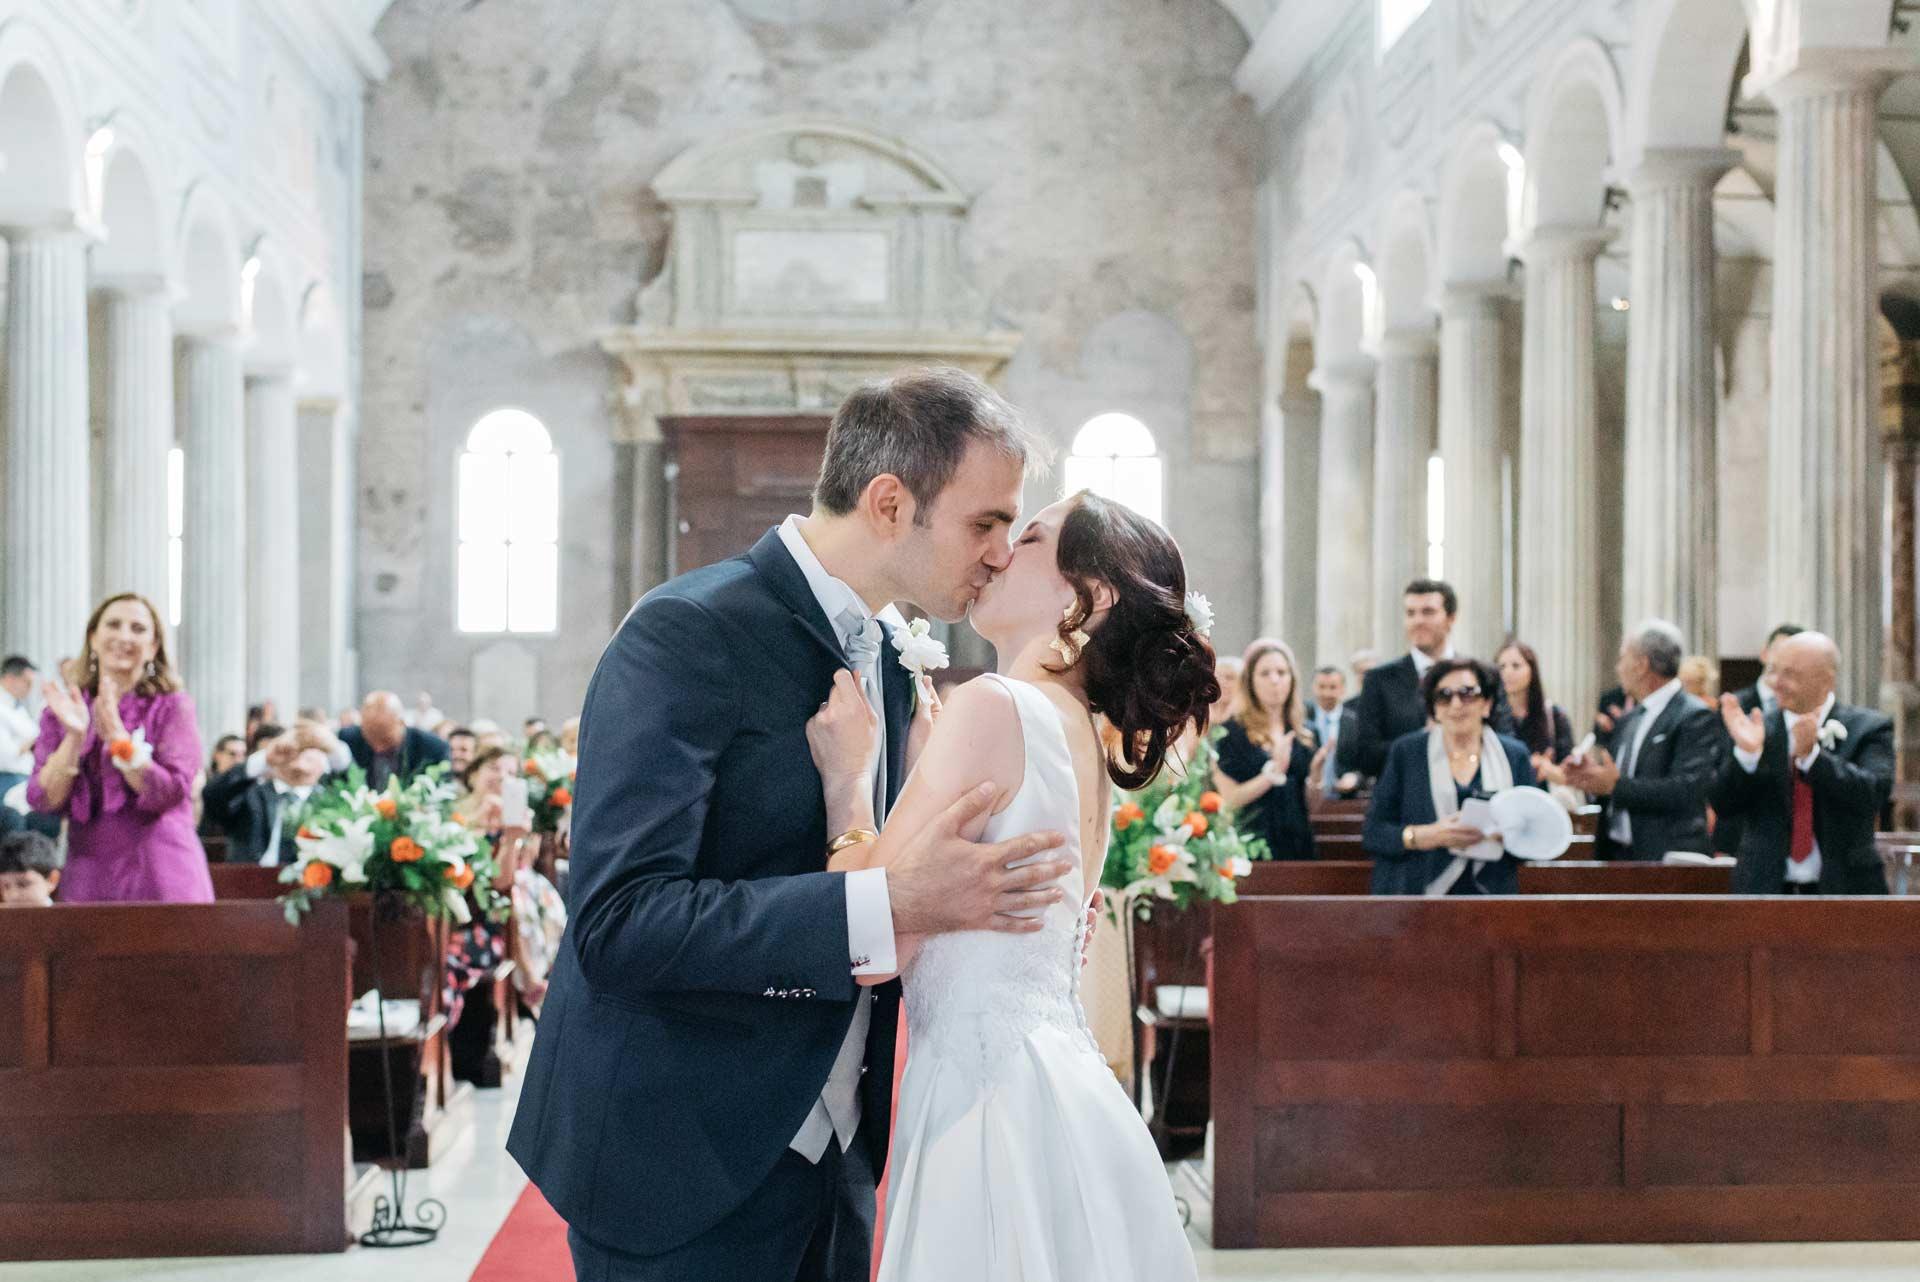 fotografo-matrimonio-reportage-roma-5-C&M-simone-nunzi